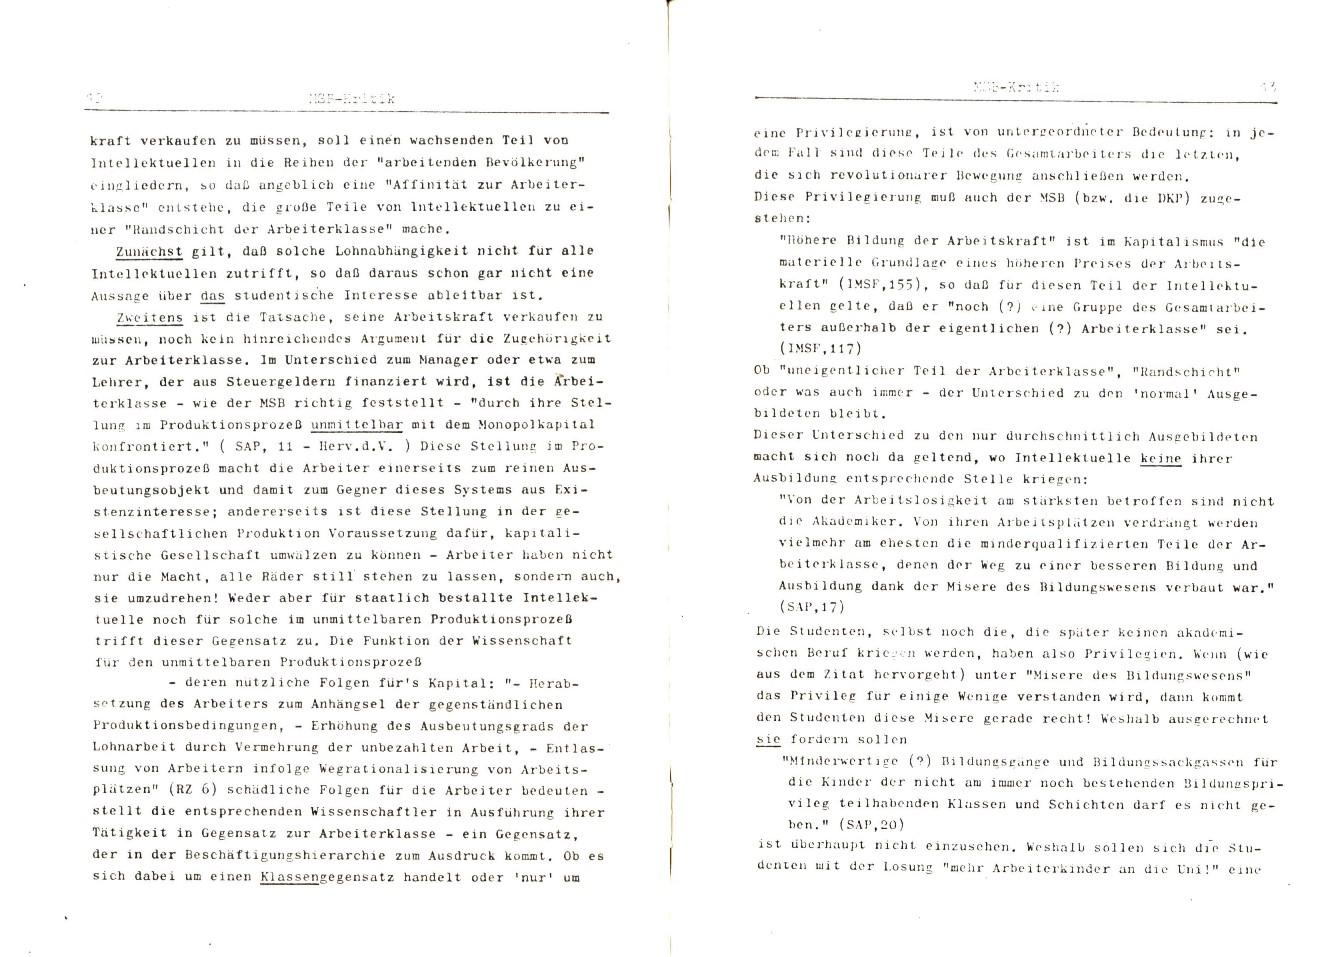 Muenster_SHO_1977_Studenteninteressen_07